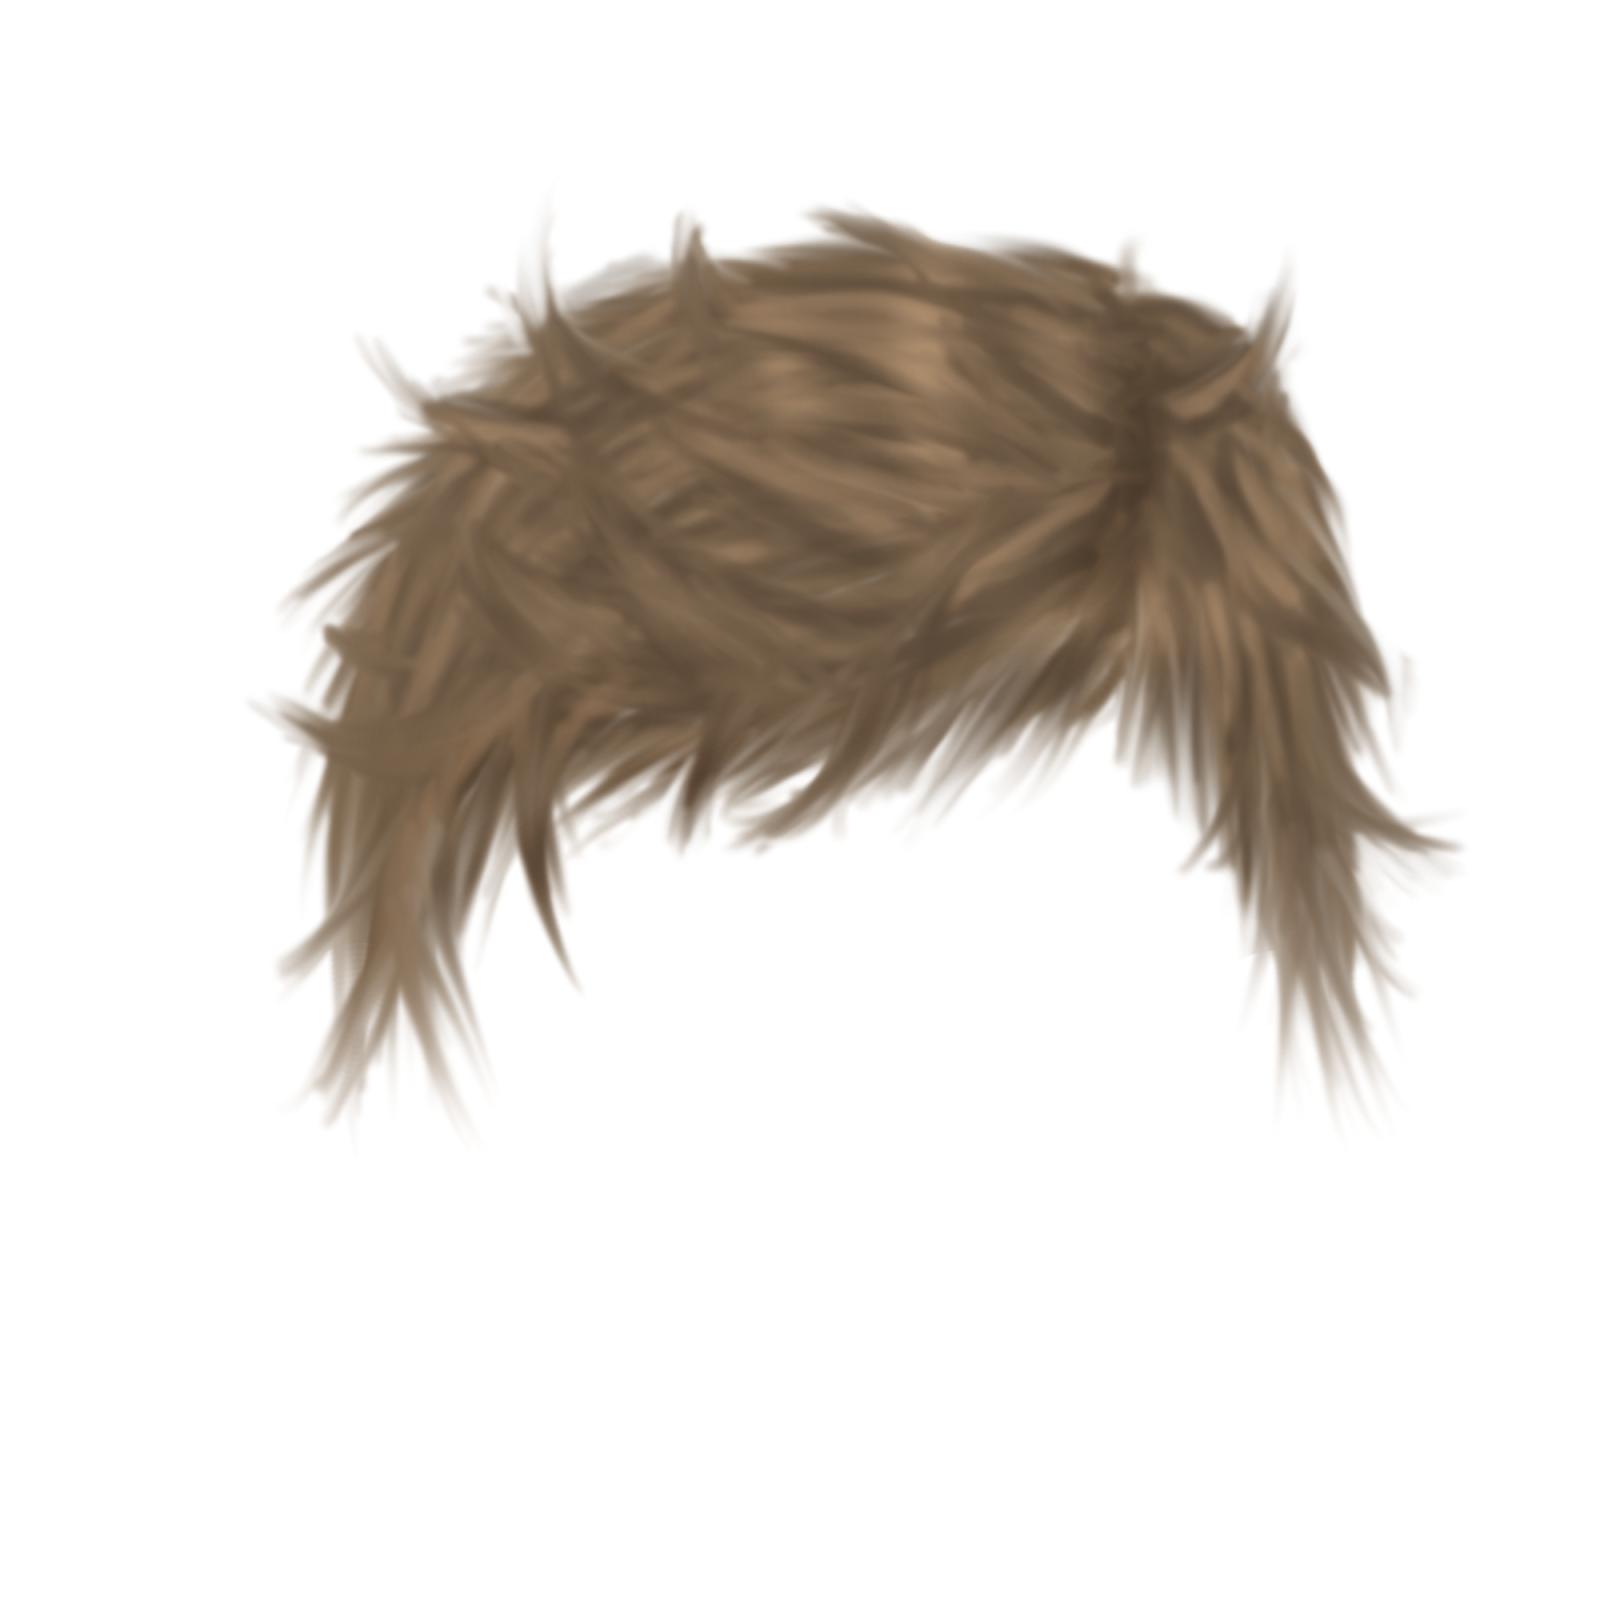 Part01] Real Hair PNG Zip File Free Download.